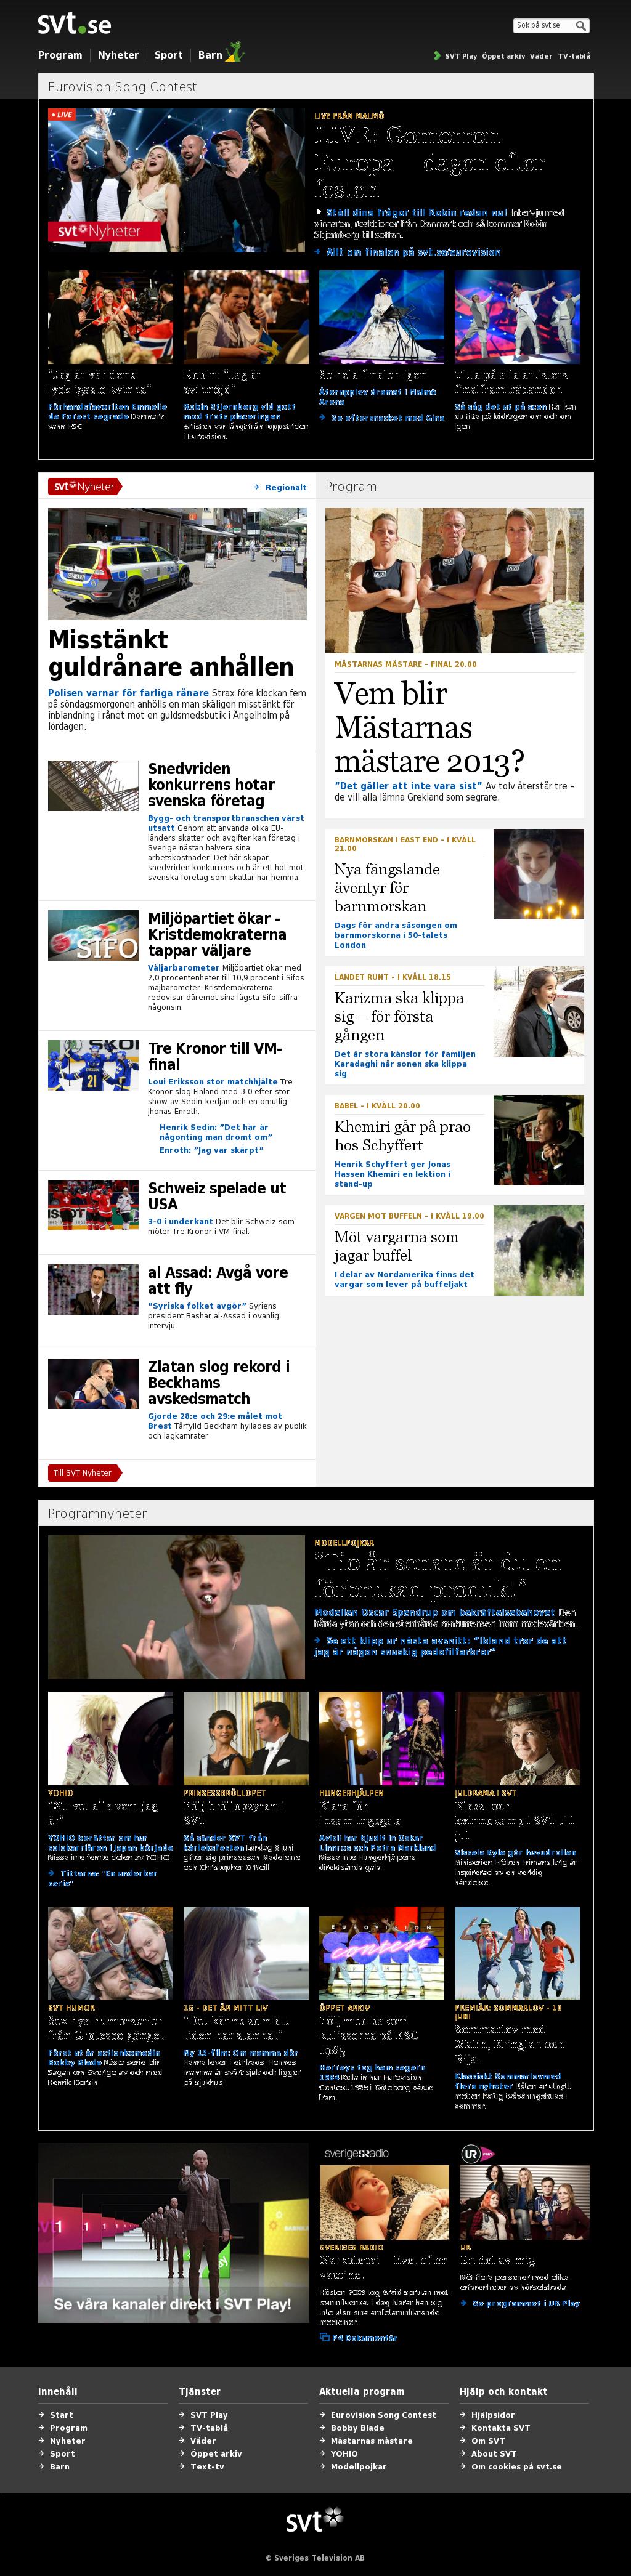 SVT at Sunday May 19, 2013, 8:20 a.m. UTC